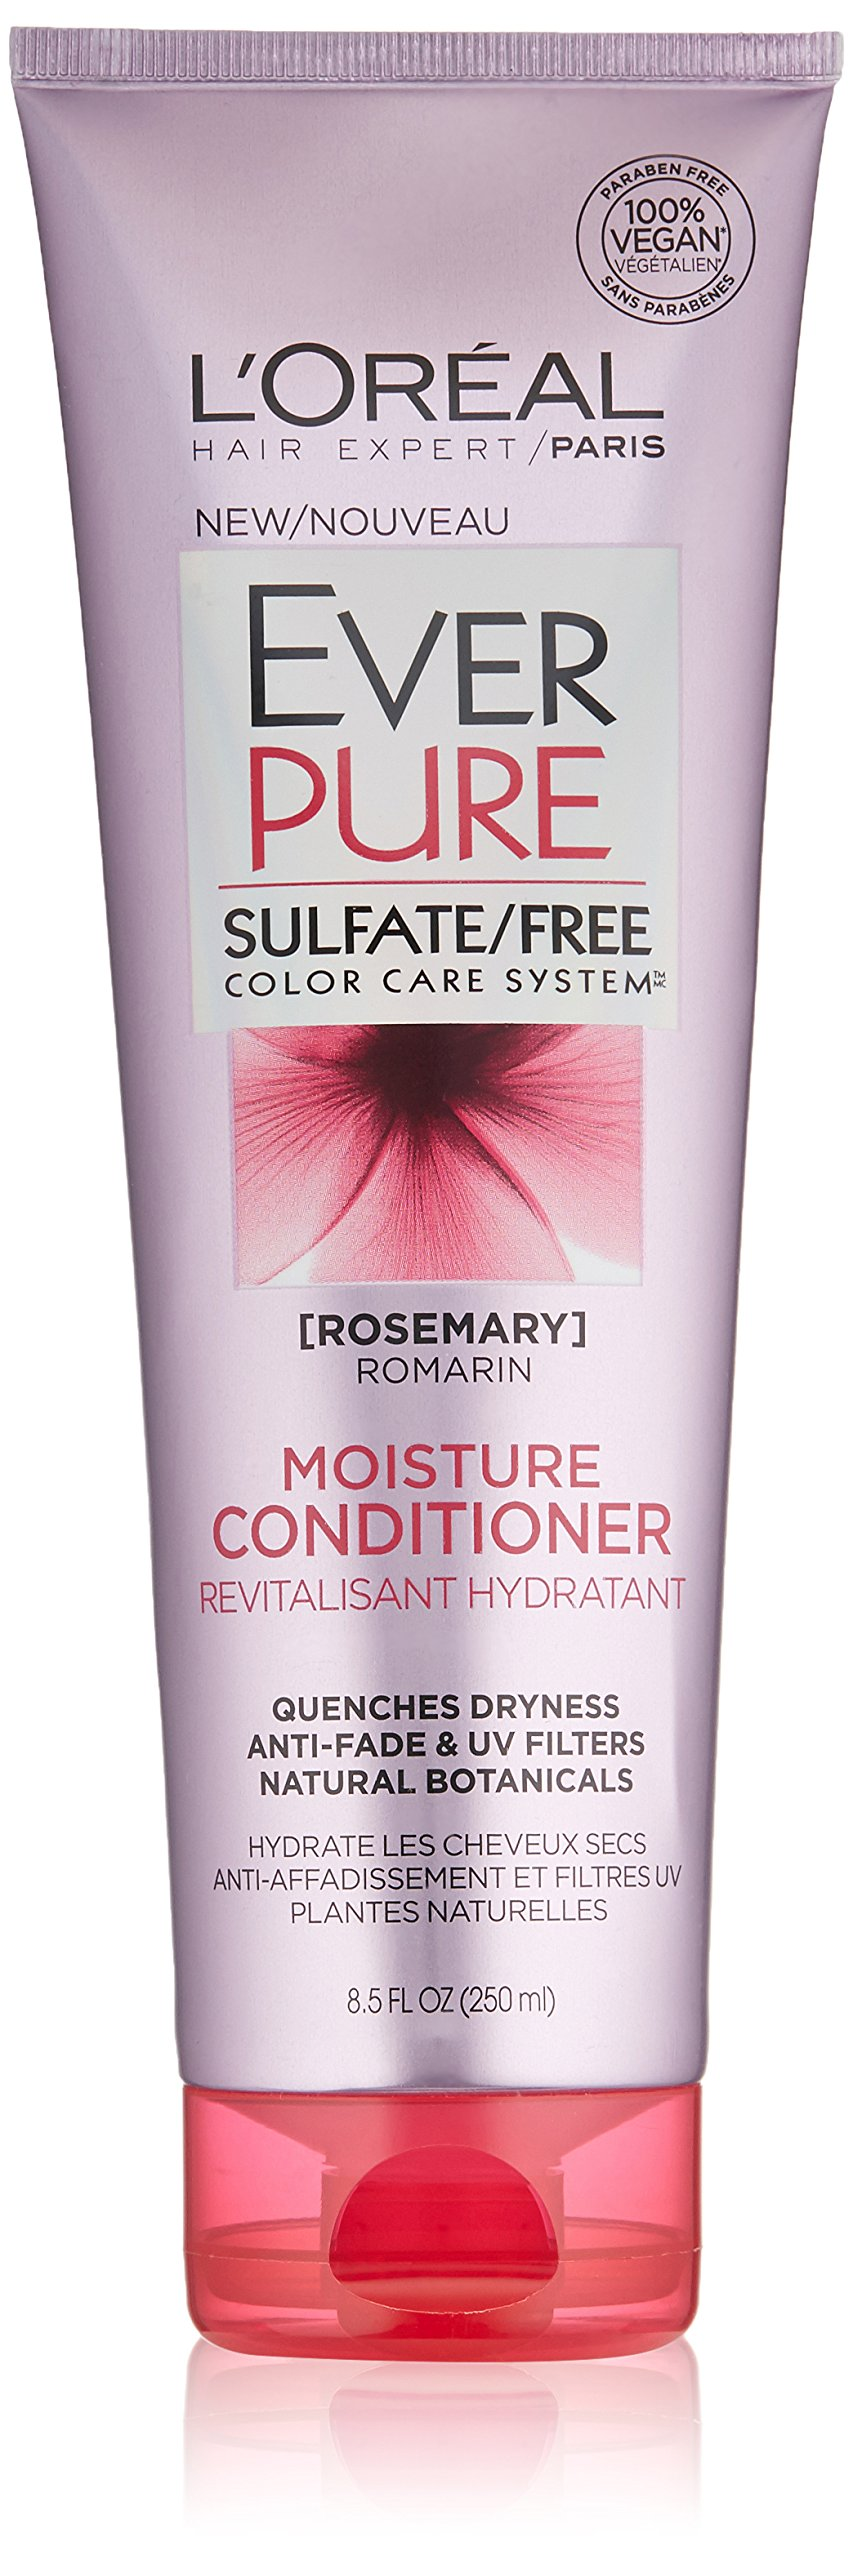 L'Oréal Paris EverPure Sulfate Free Moisture Conditioner, 8.5 fl. oz.